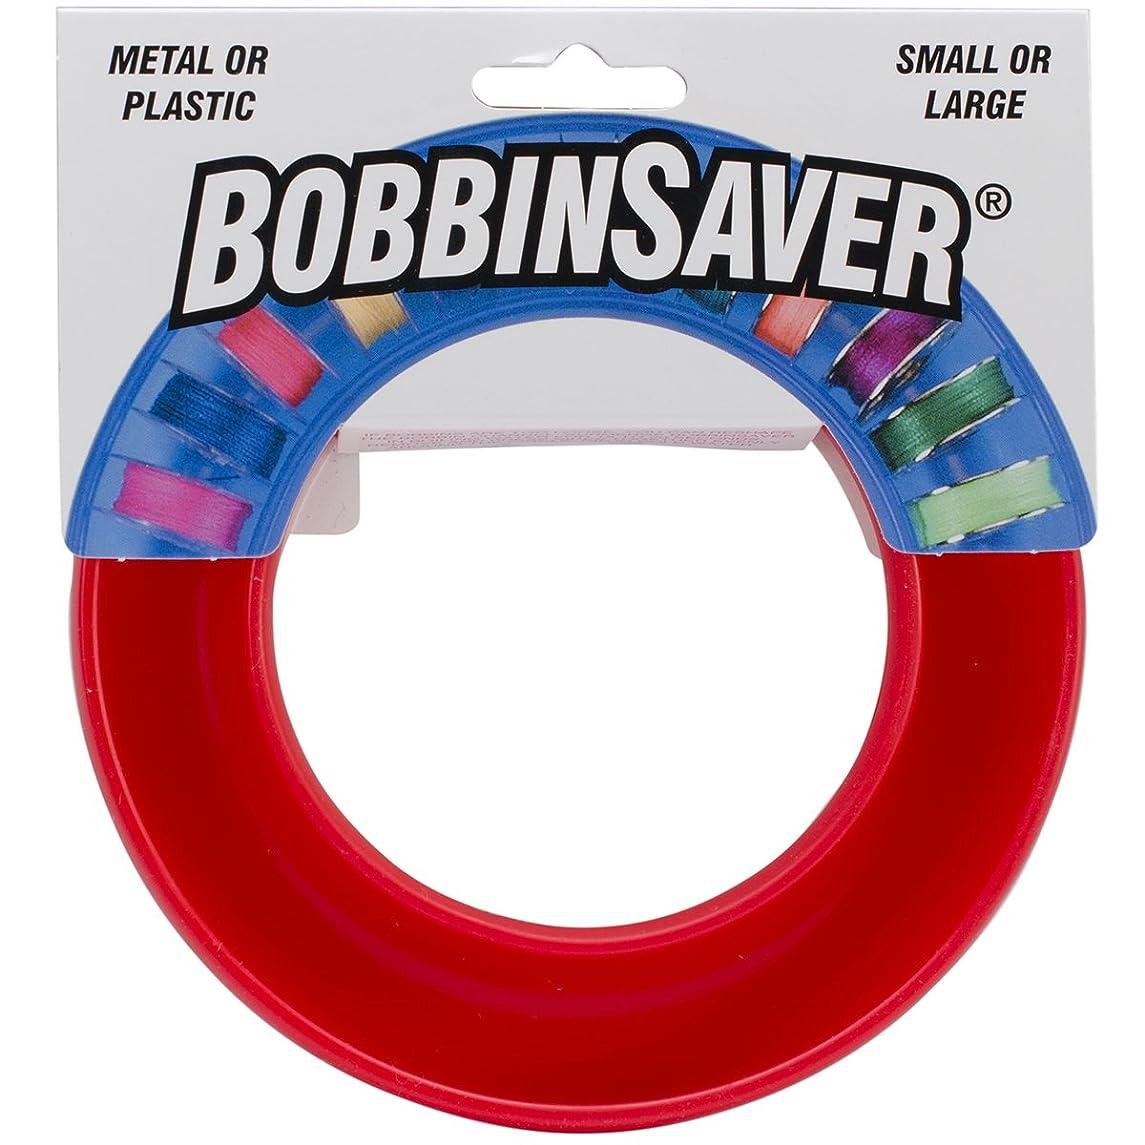 BobbinSaver Sewing Machine Bobbin Organizer - Holds 20+ Bobbins - Red